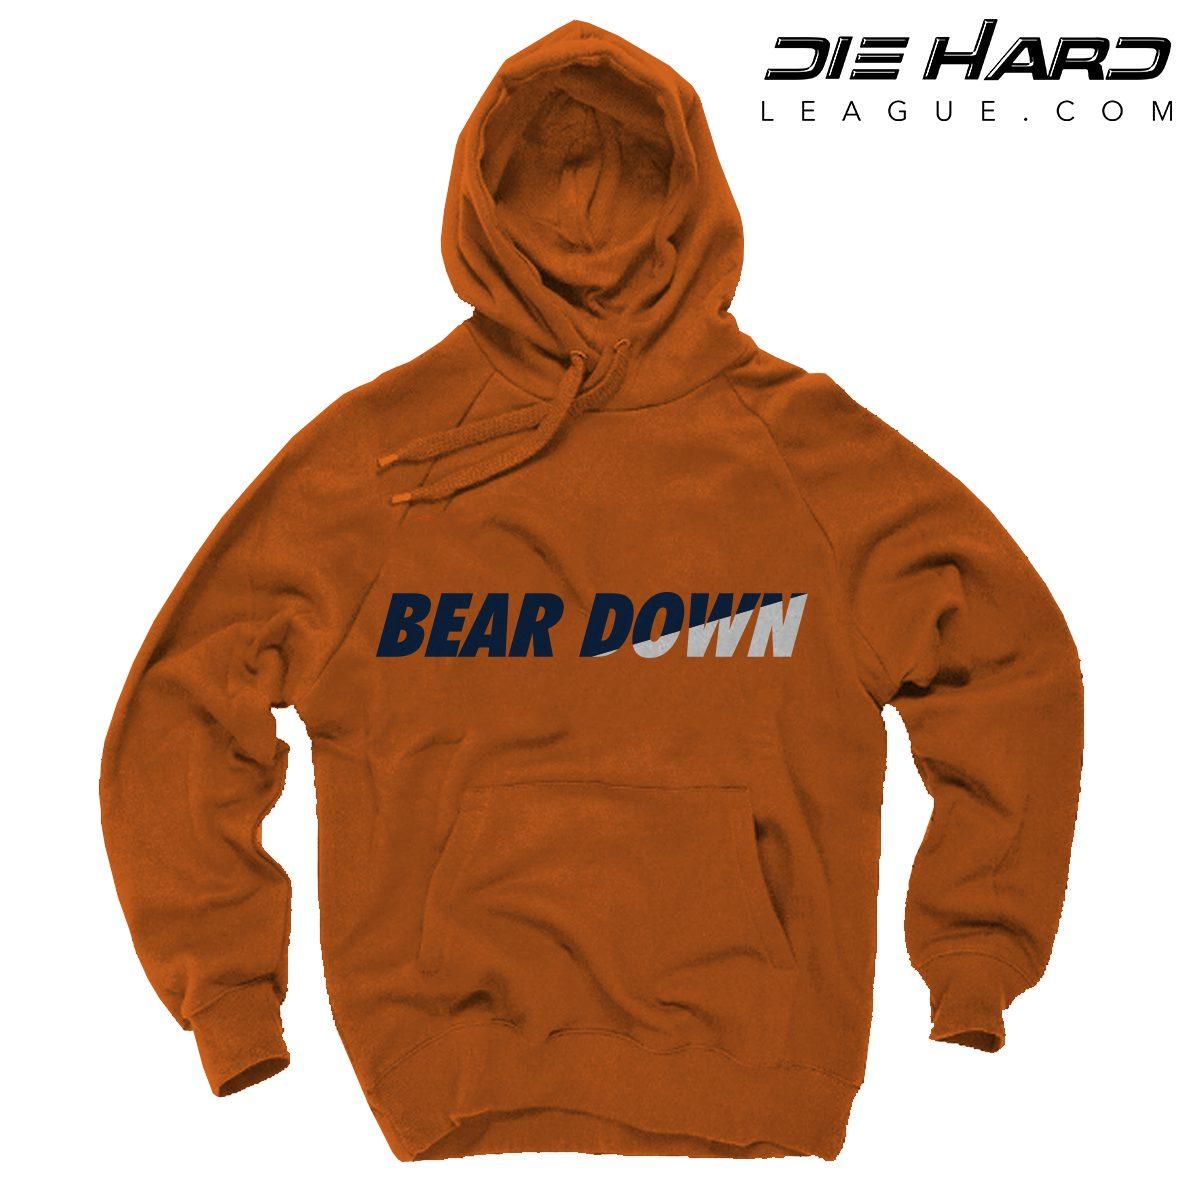 58e53c2e Bears Hoodie Chicago - Bear Down Orange Hoodie [Best Priced]